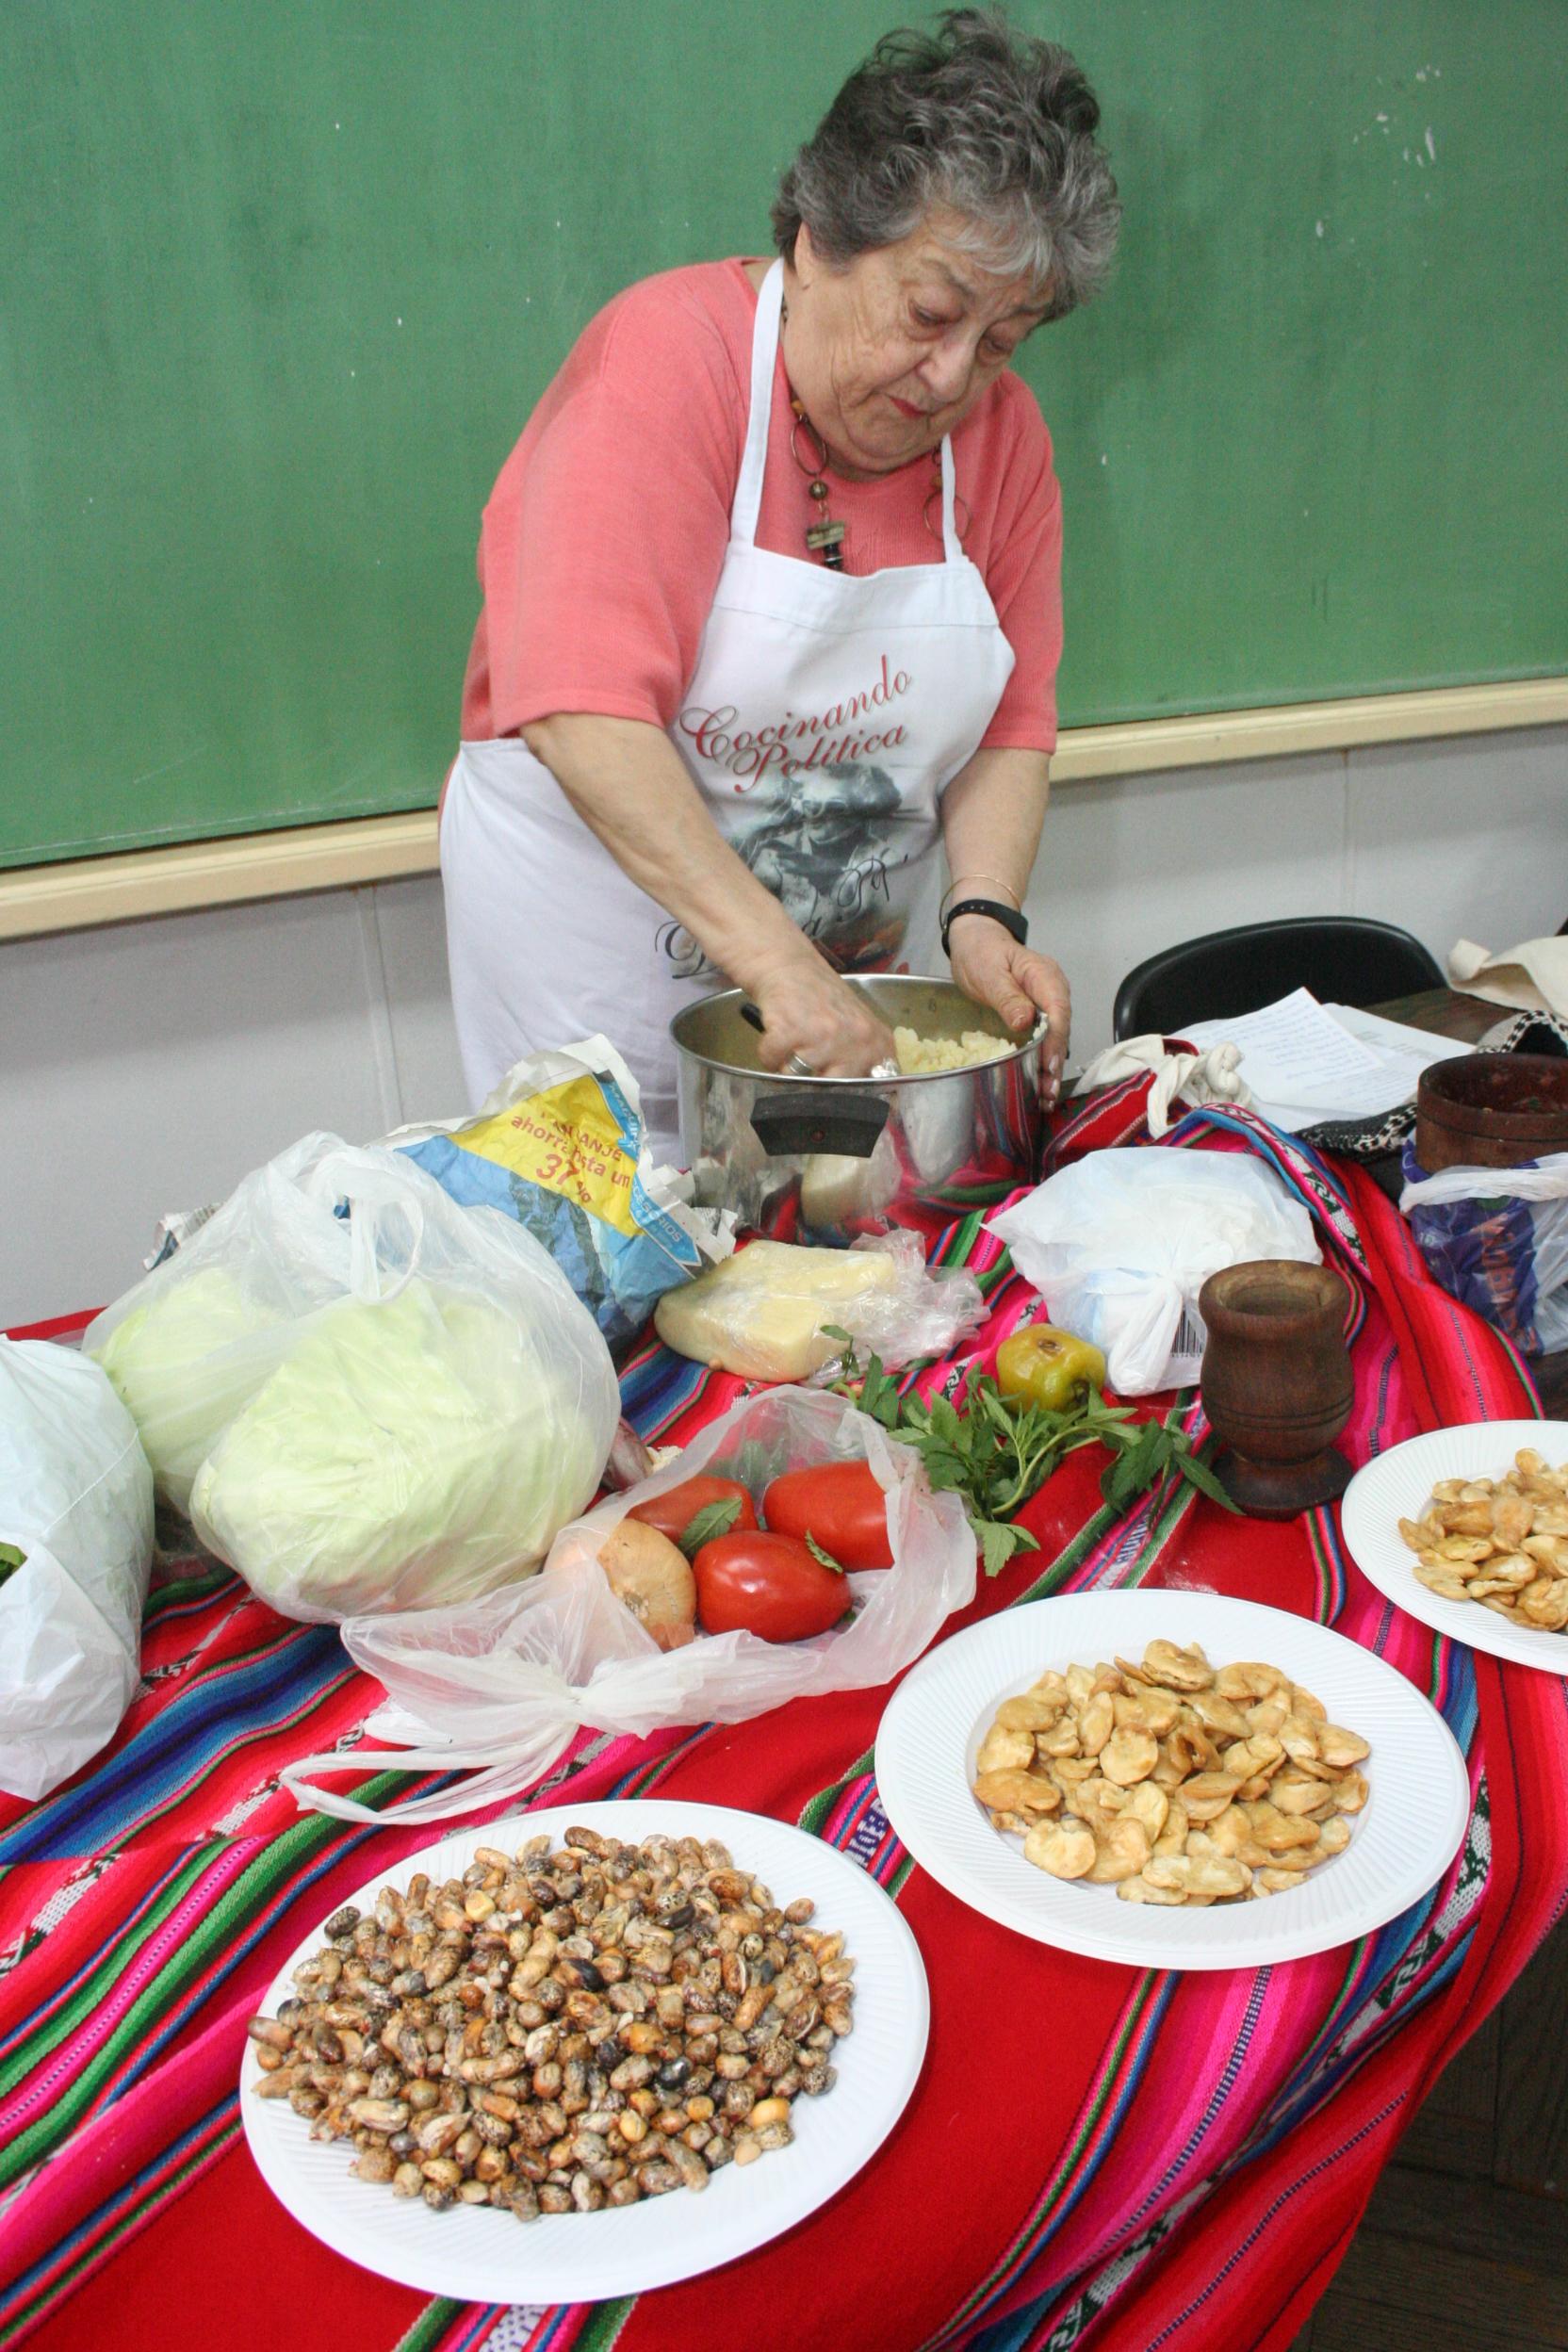 Cocinando | File 20 Cocinando Politica Jpg Wikimedia Commons